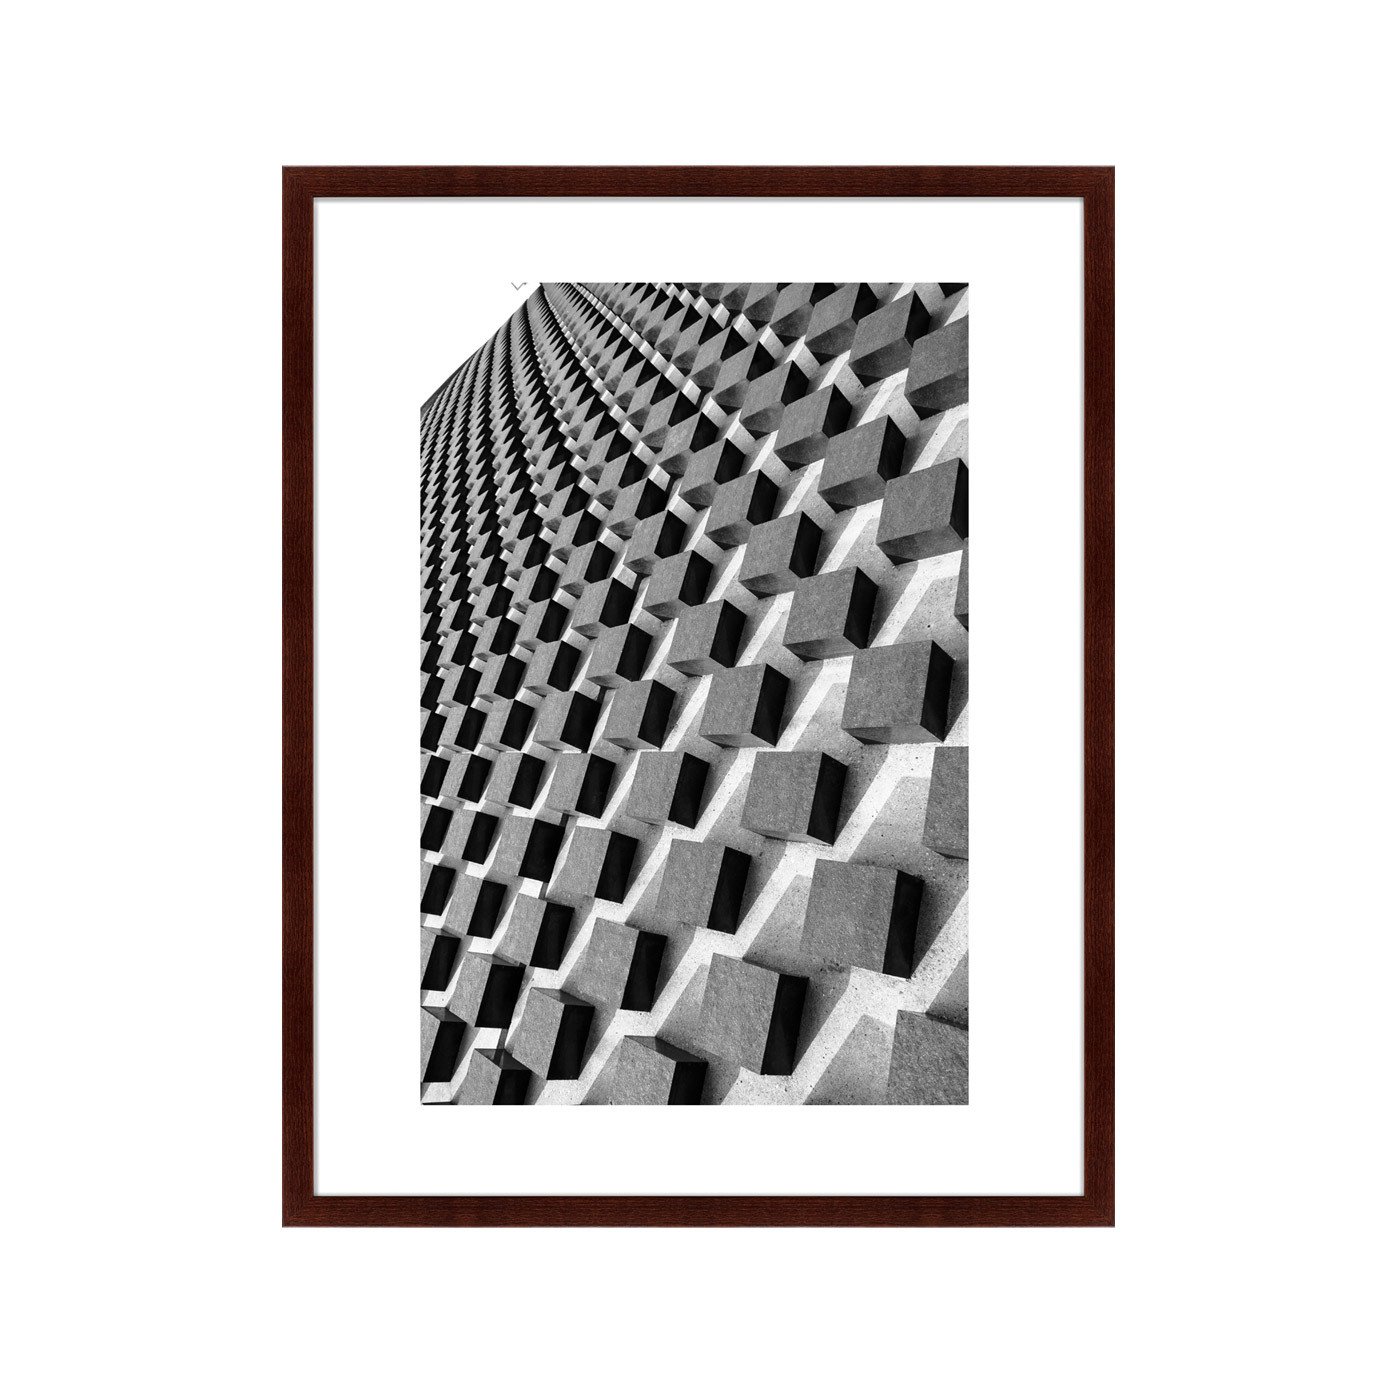 {} Картины в Квартиру Картина Свет и Форма (79х100 см) картины в квартиру картина игра света 79х100 см